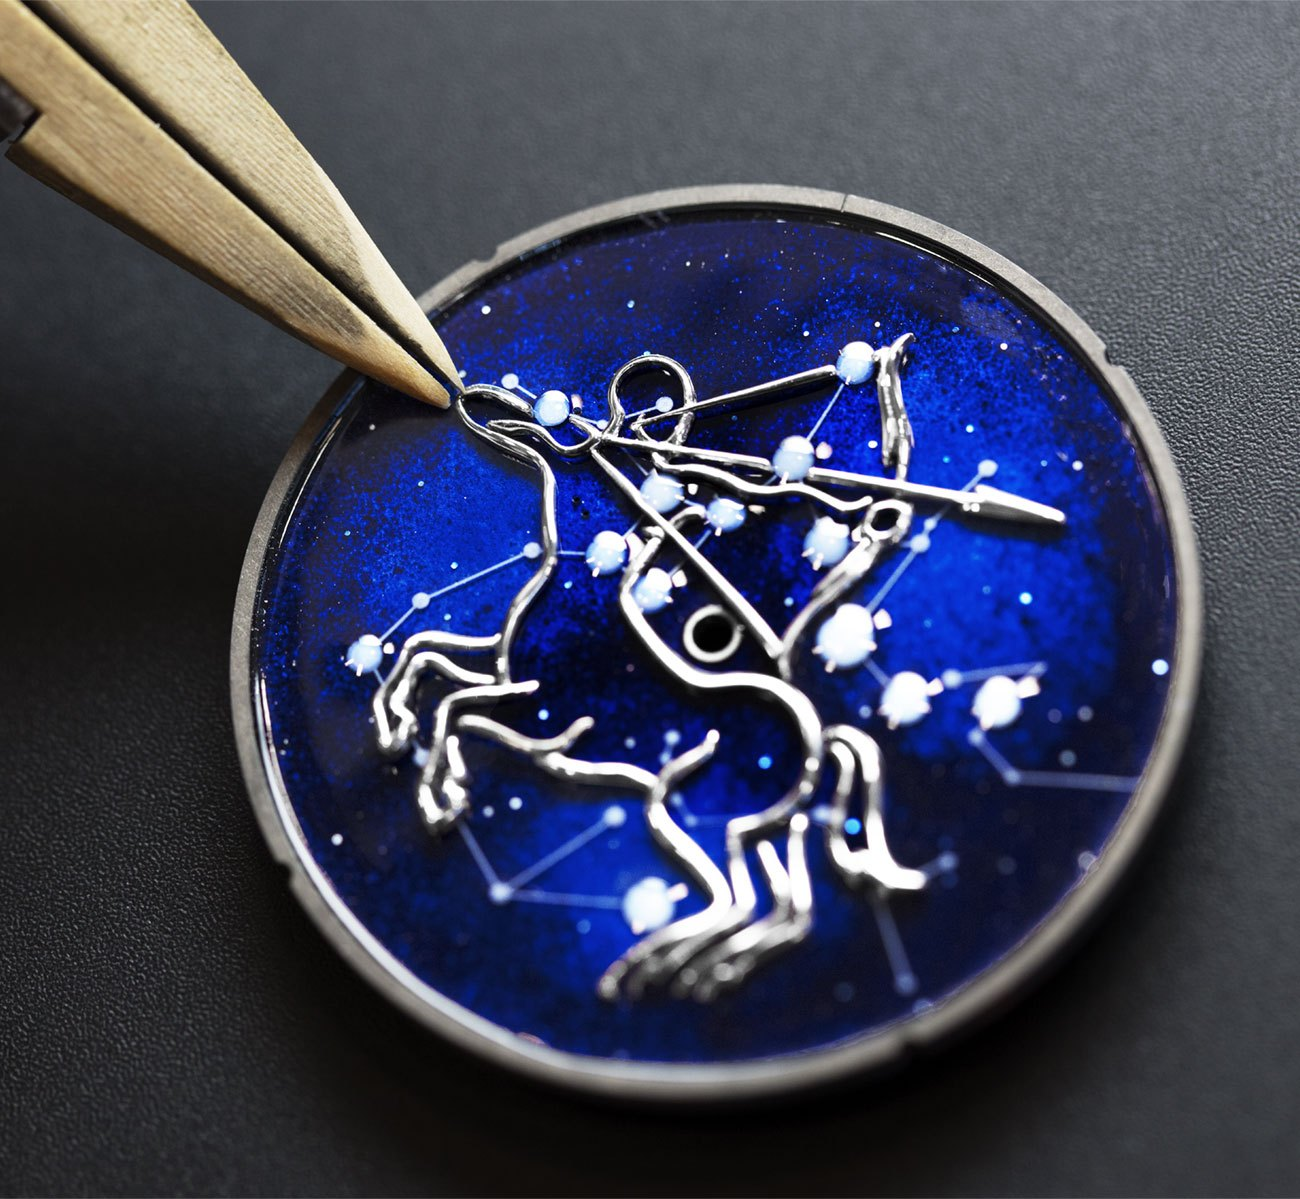 Van-Cleef-Arpels-Lady-Arpels-Midnight-Zodiac-Lumineux-10.jpg (1300×1199)